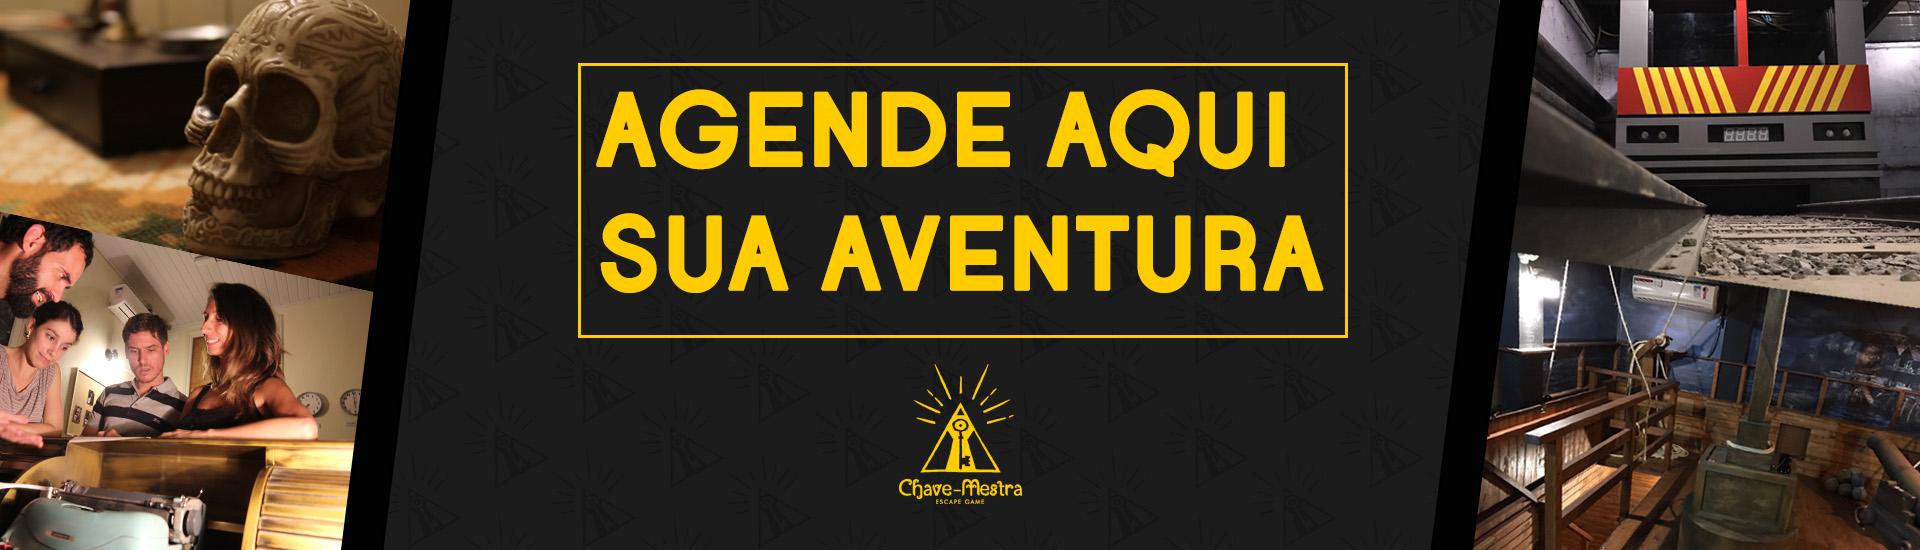 Agende sua Aventura, bg, Chave-Mestra Escape Game Gramado, Chave Mestra Escape Game Gramado, chavemestra, chave-mestra, escape game, escape room, gramado